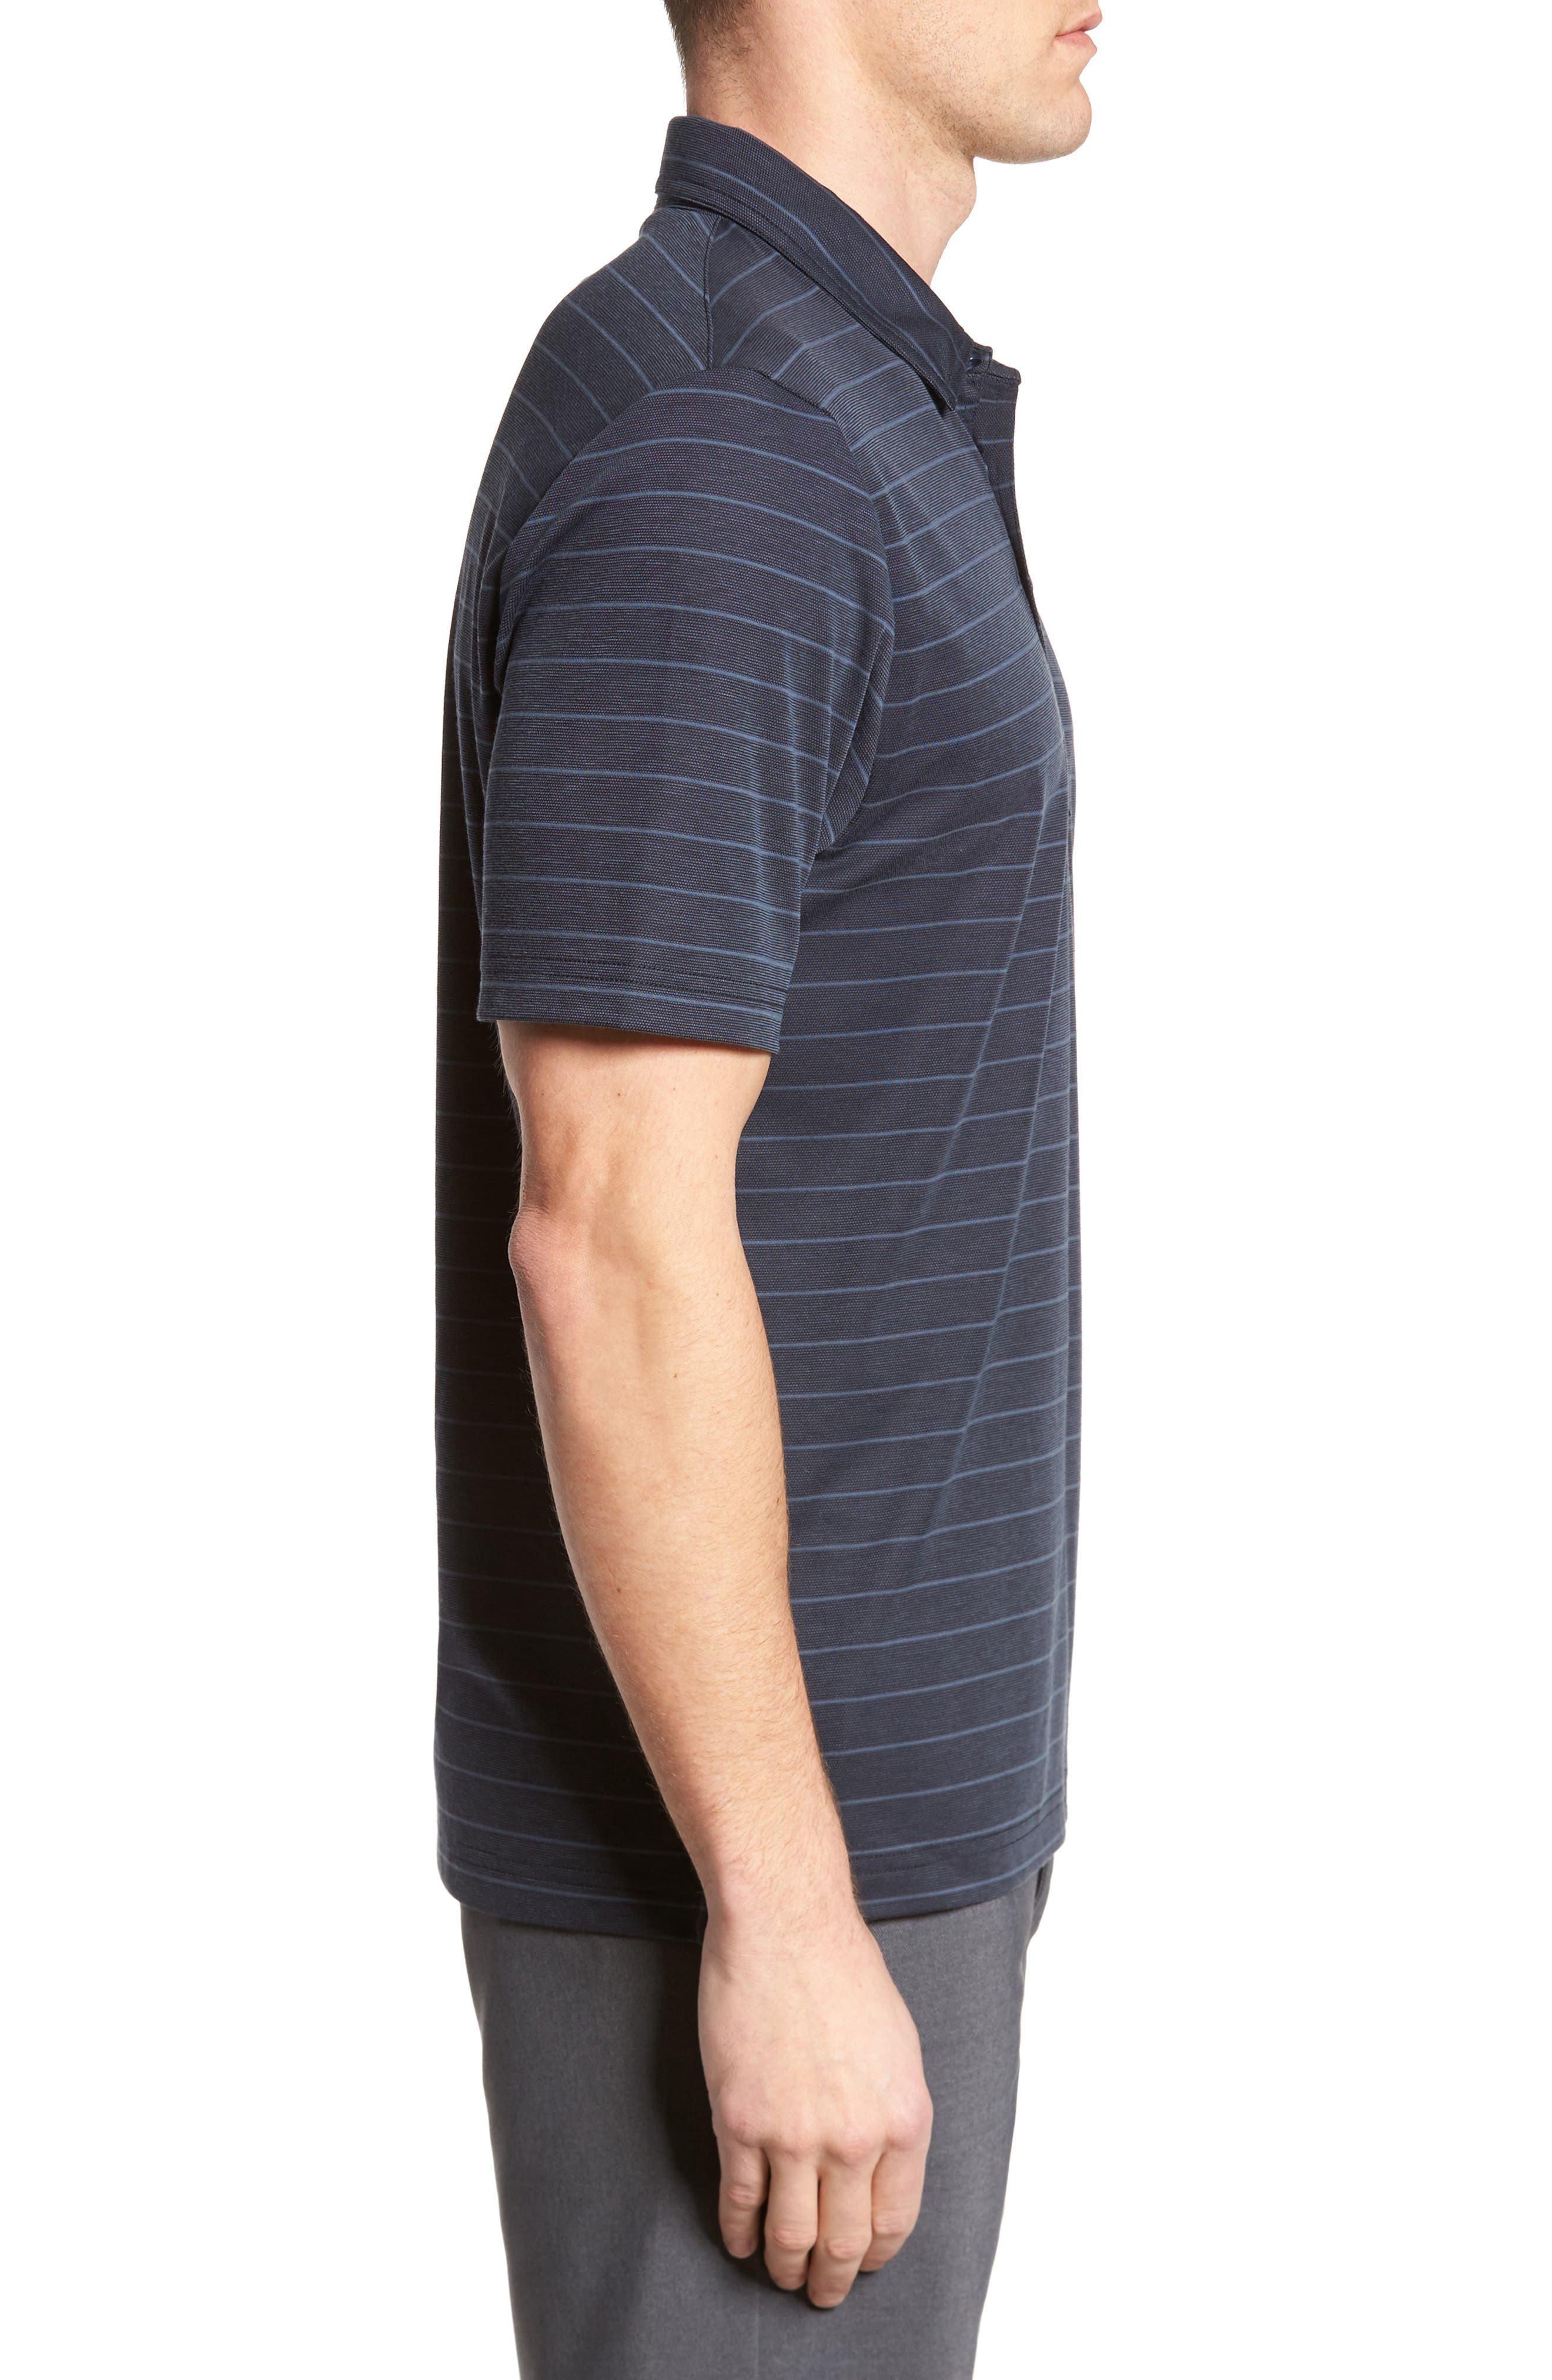 Marini Polo Shirt,                             Alternate thumbnail 3, color,                             Blue Nights/ Allure